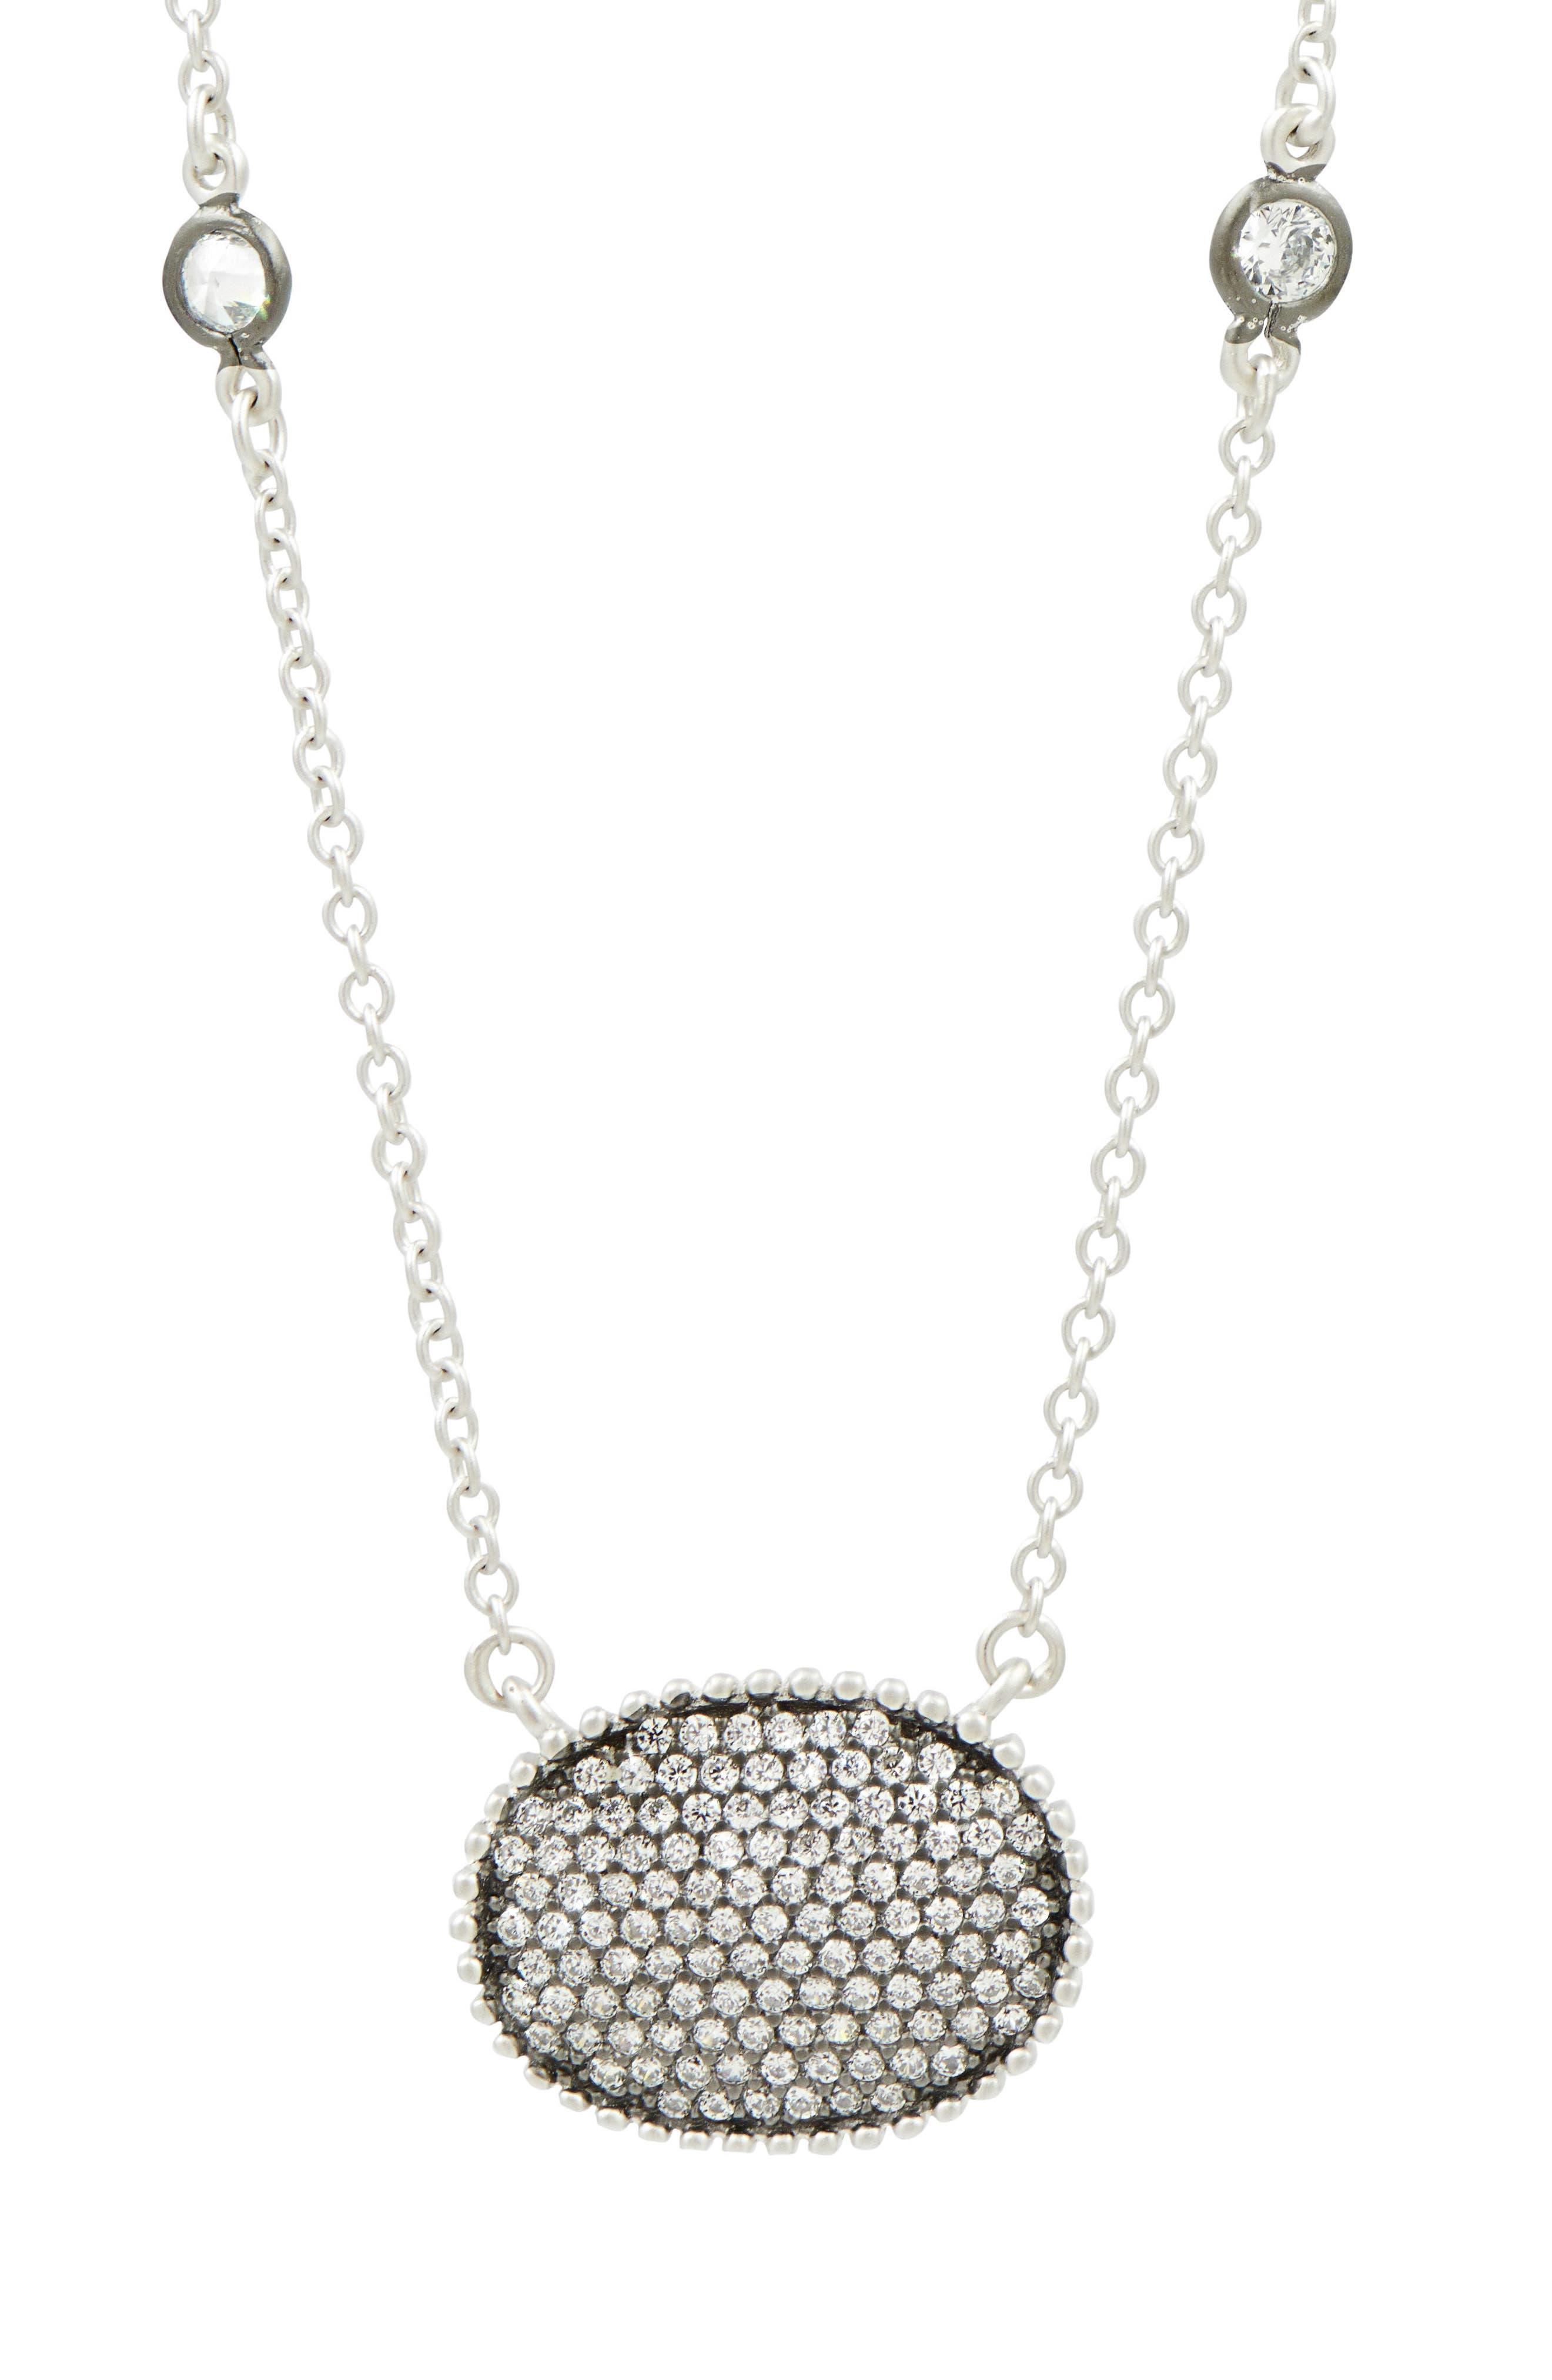 Oval Pendant Necklace,                         Main,                         color, SILVER/ BLACK RHODIUM